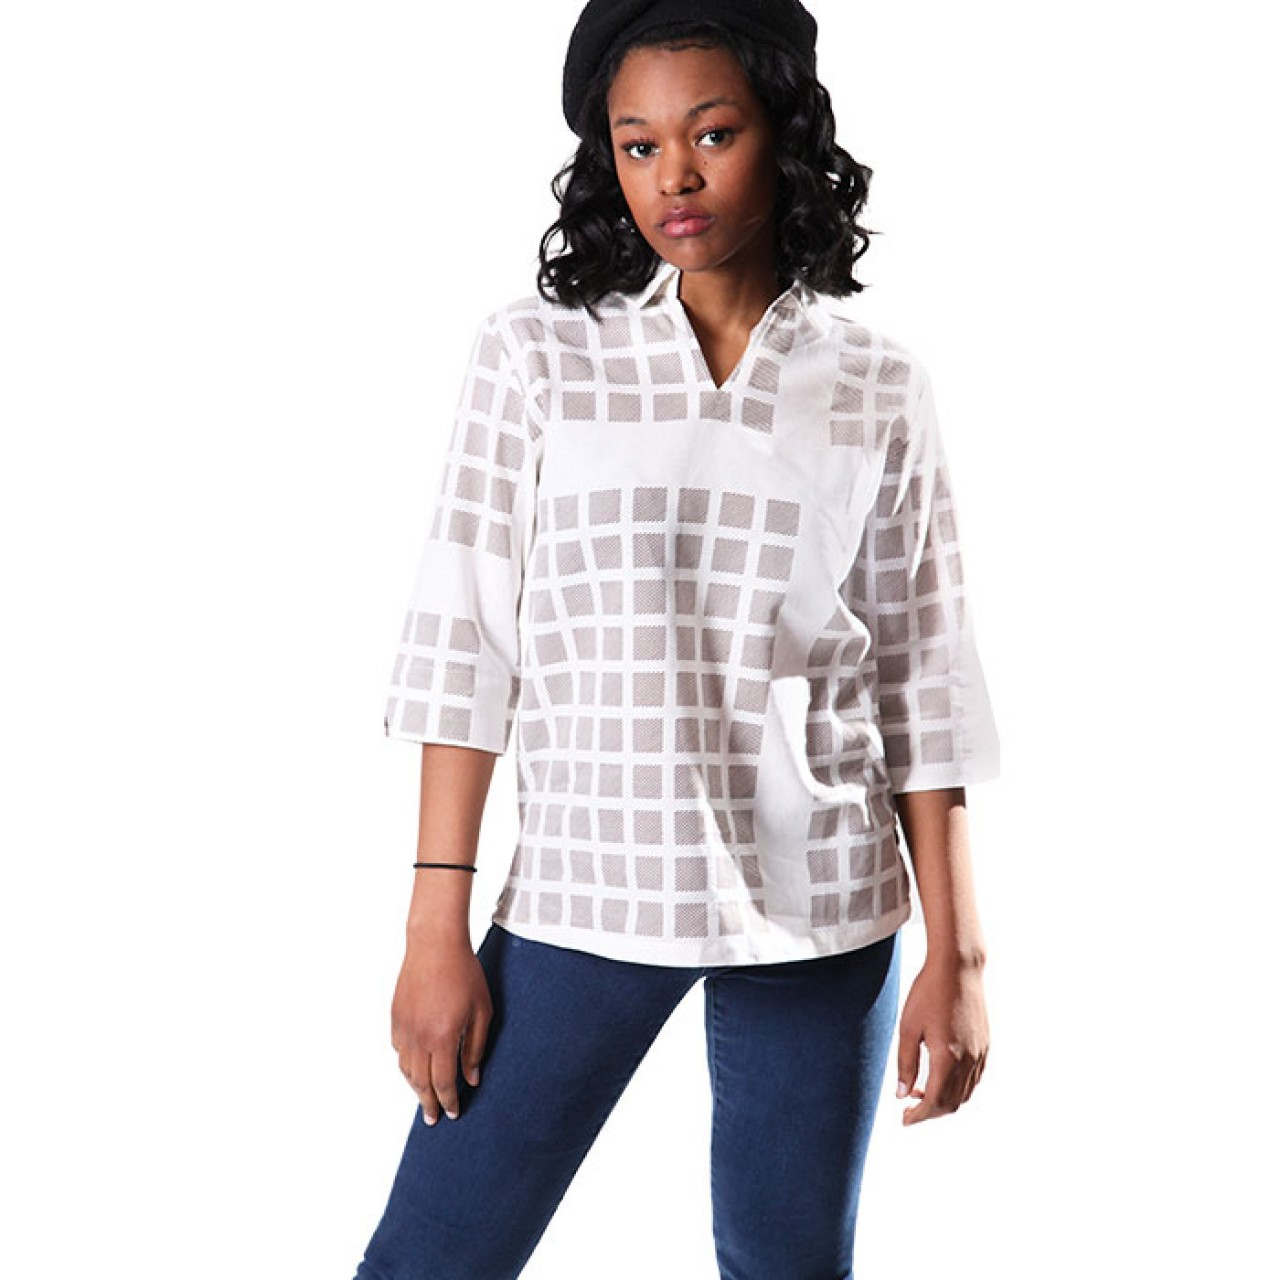 Women's Casual Checked White Shirt